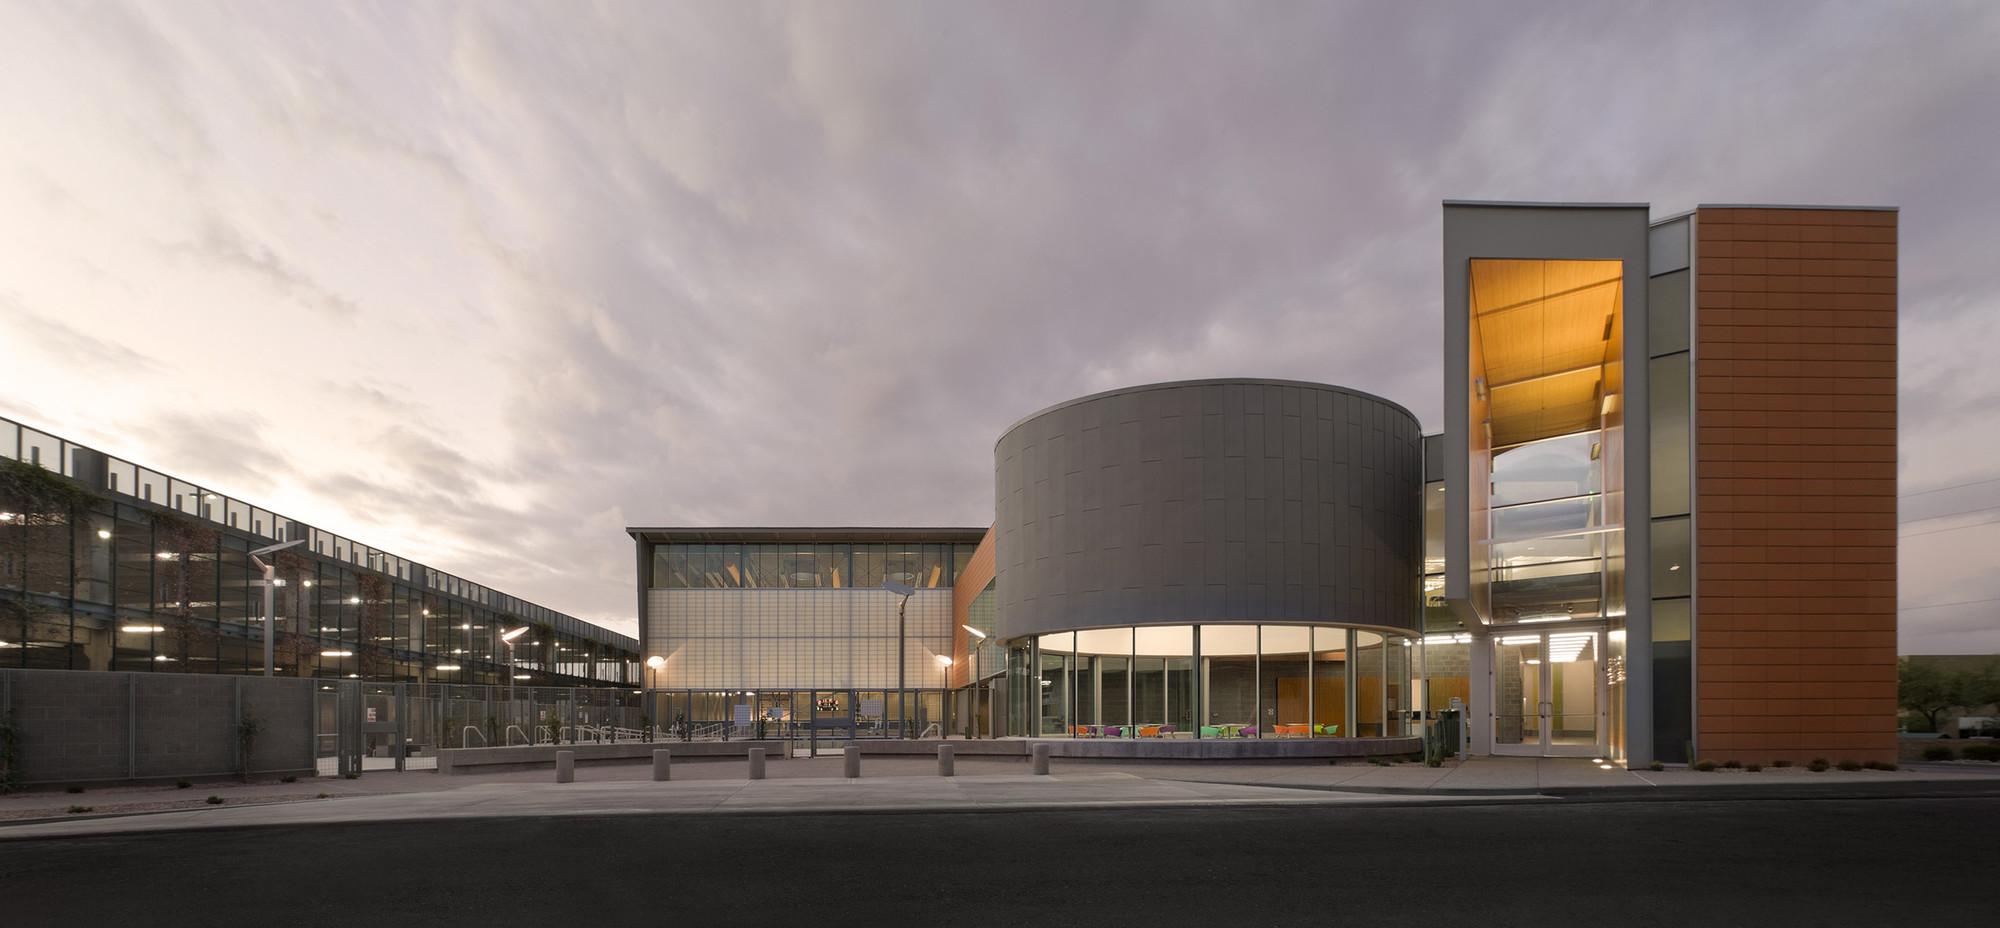 Дизайн спортивного комплекса: внешний вид